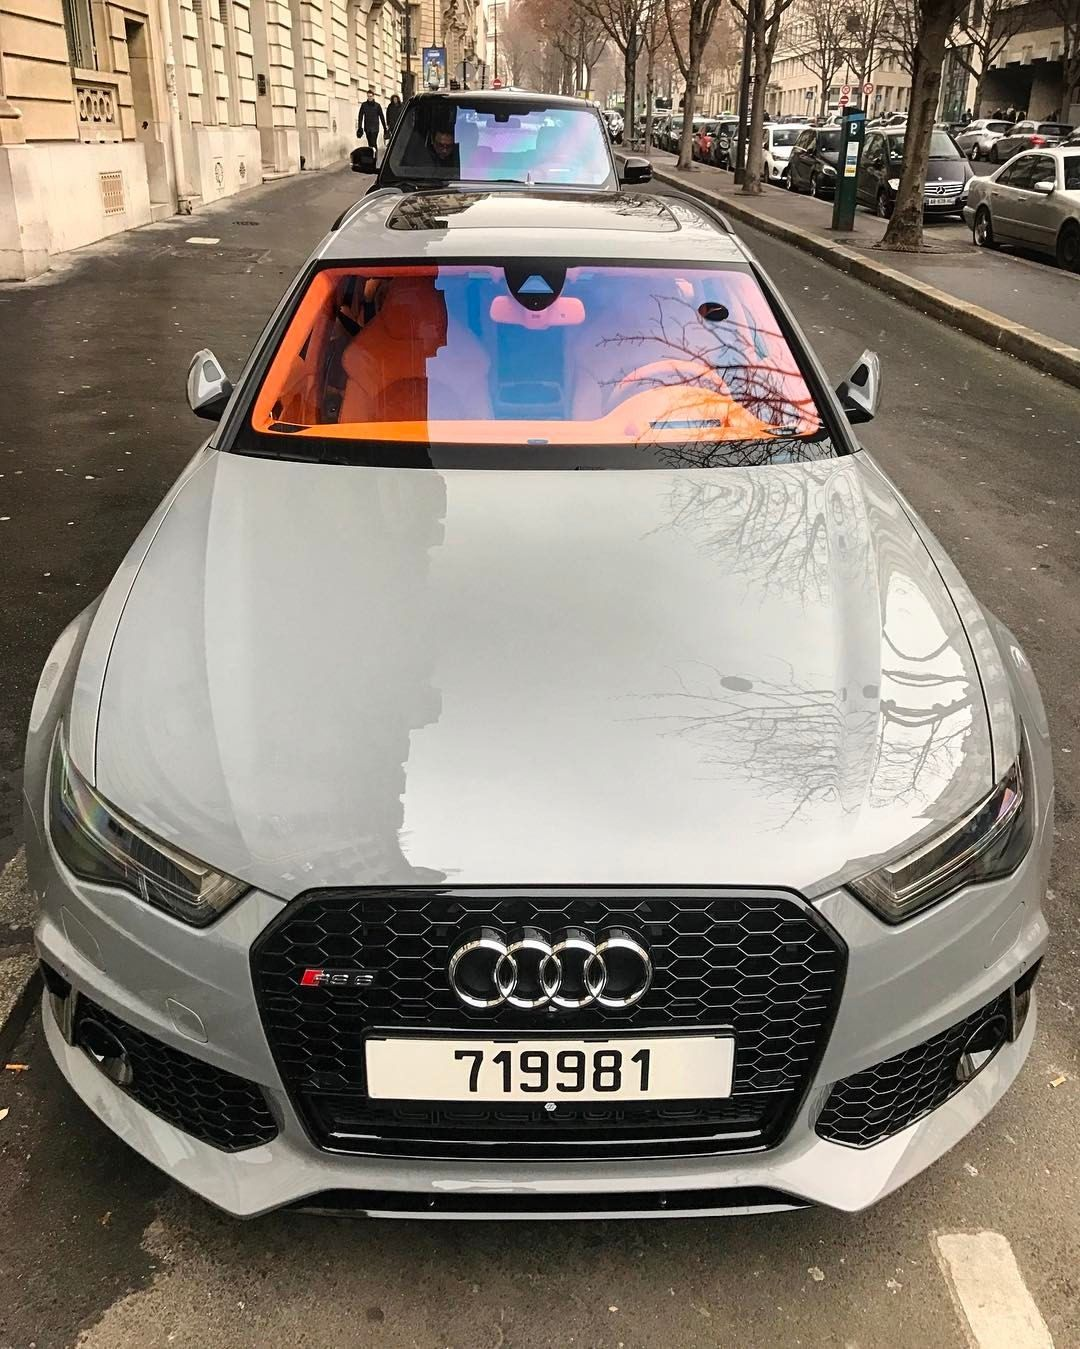 Dream Cars Audi, Audi Rs6, Audi Cars